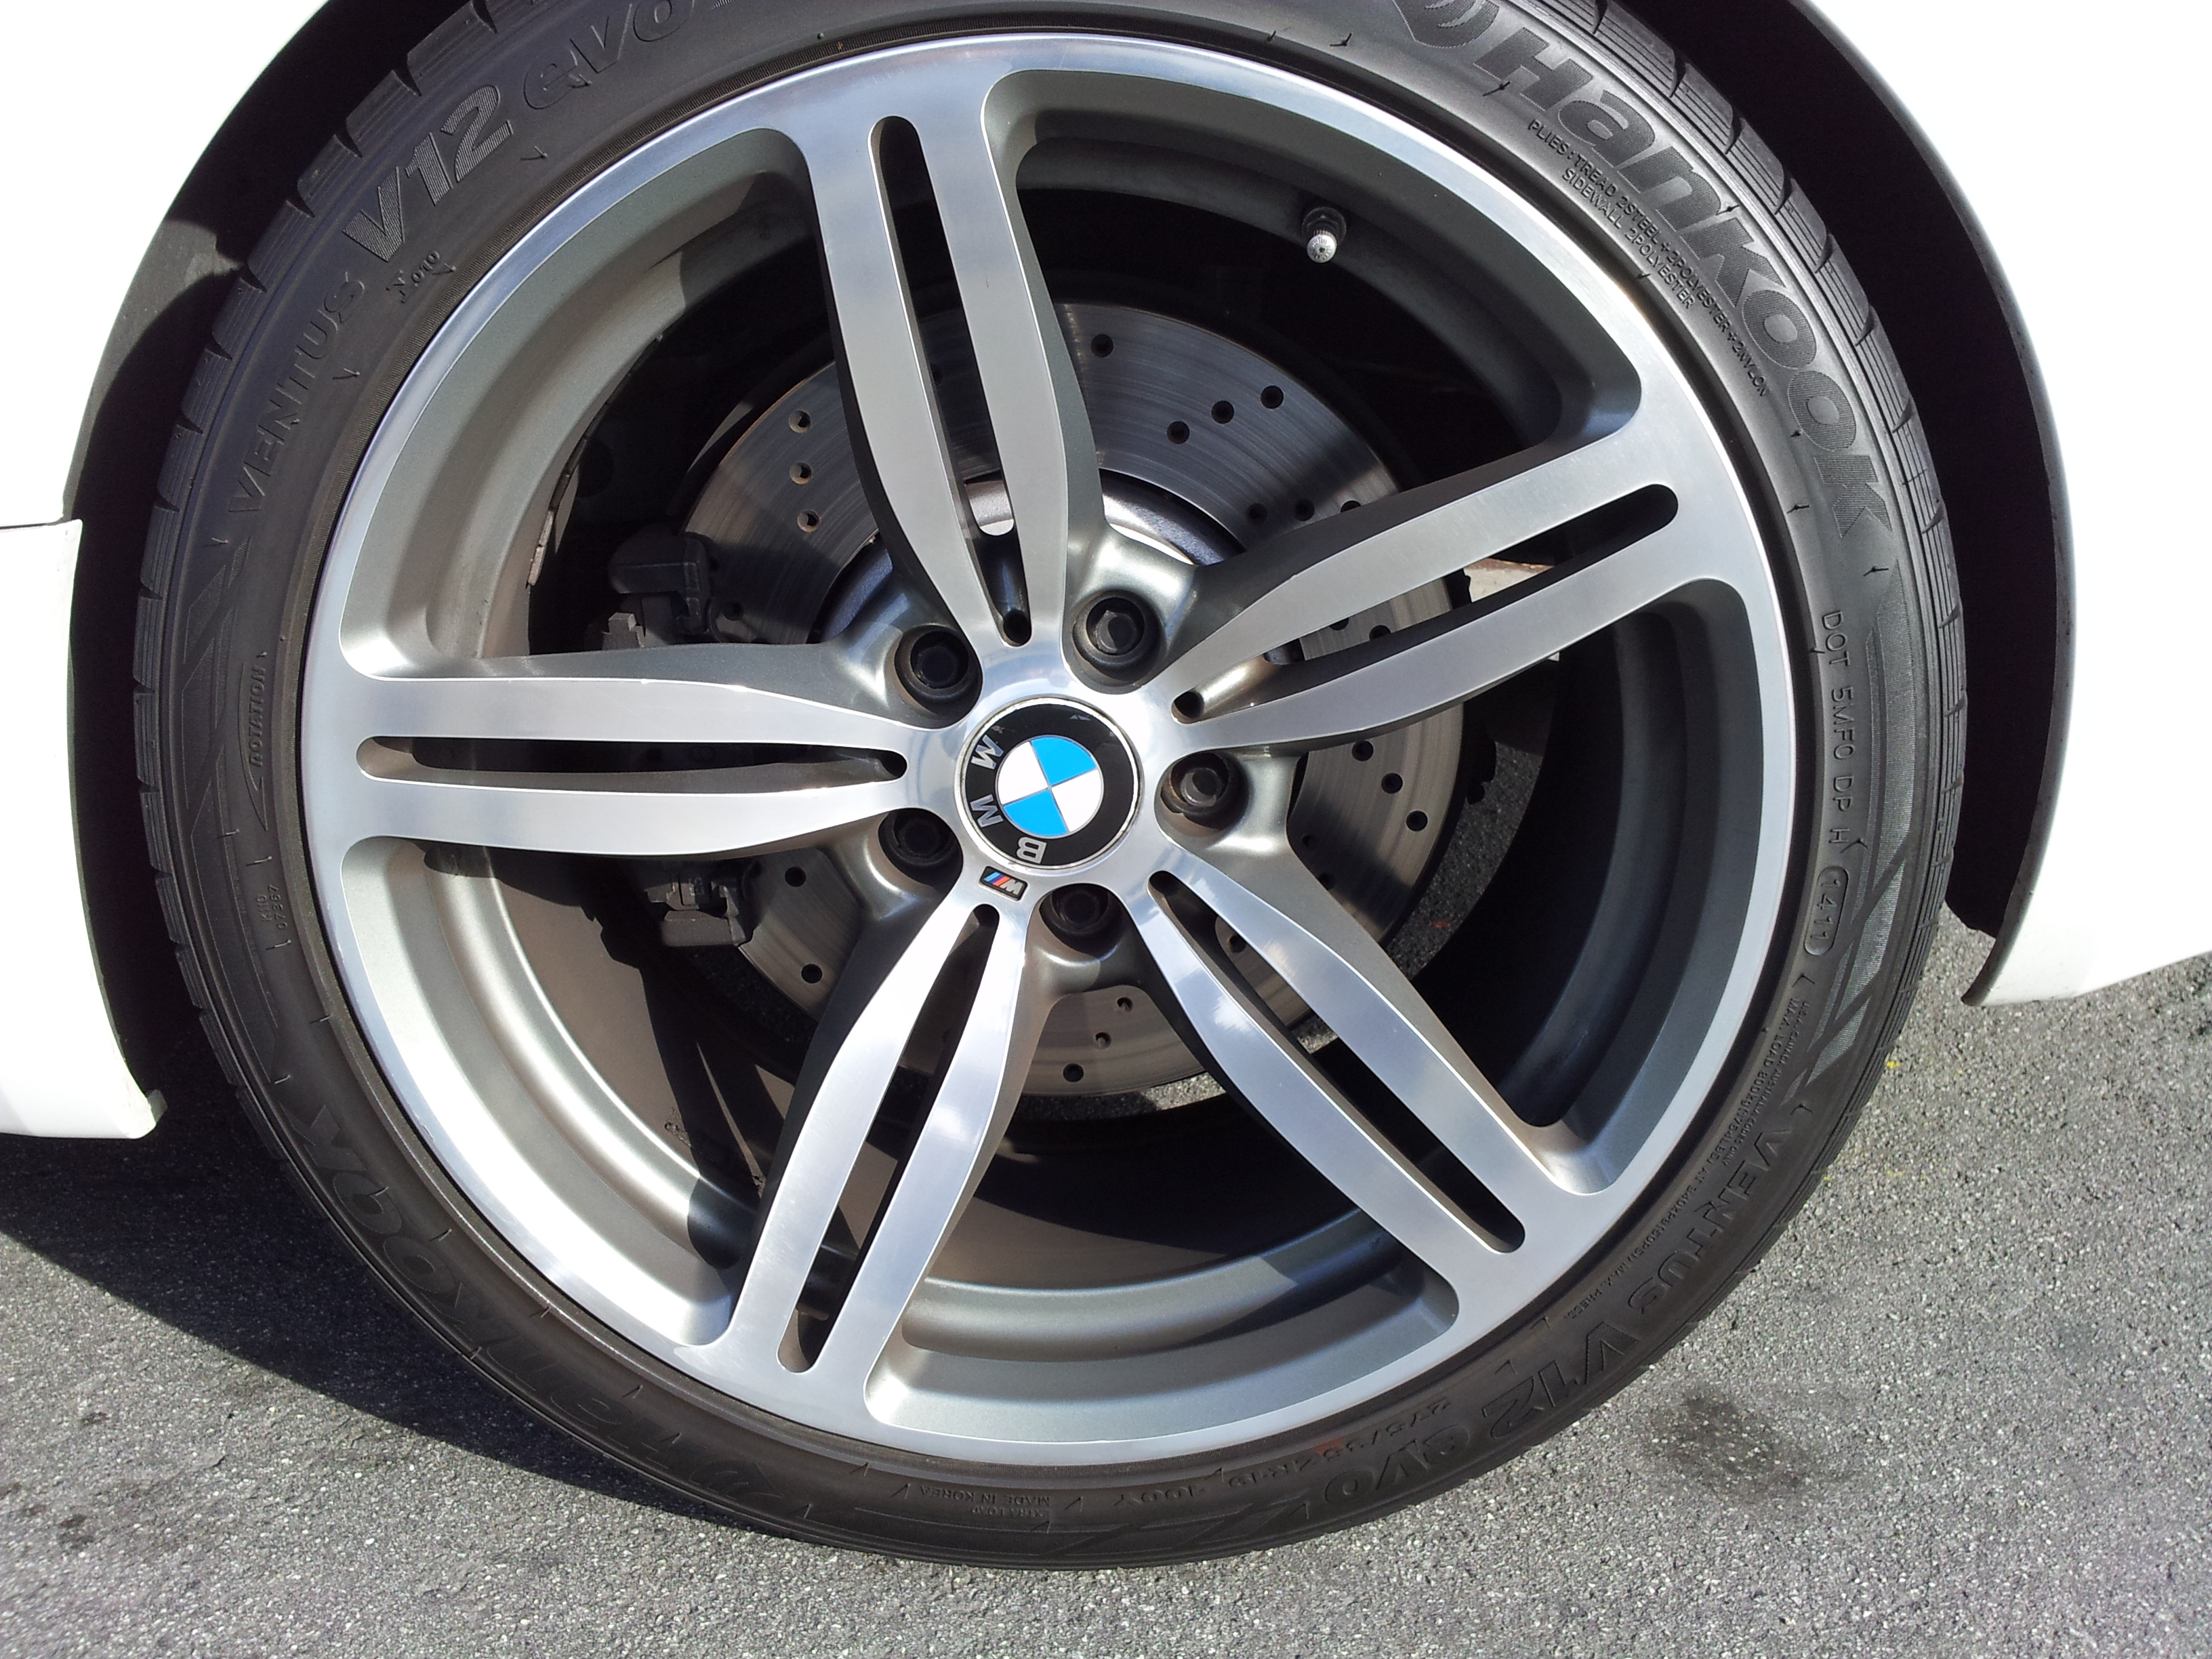 Bay Area - F/S (4) OEM M6 rims w/ tires-20120502_173553.jpg